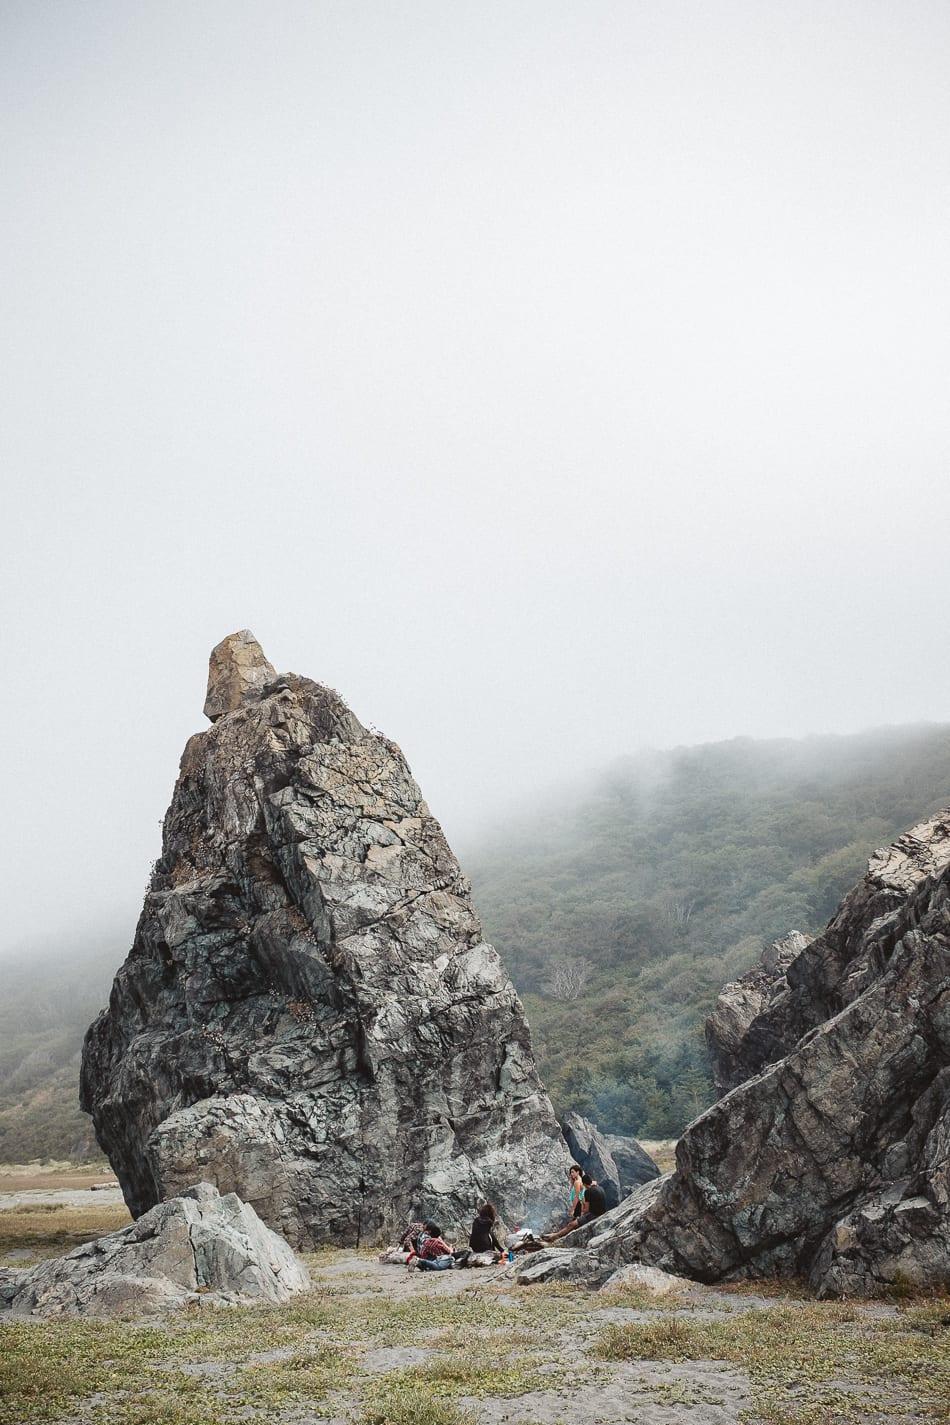 patricks-point-beach-camping-california-adventure-photographer-18